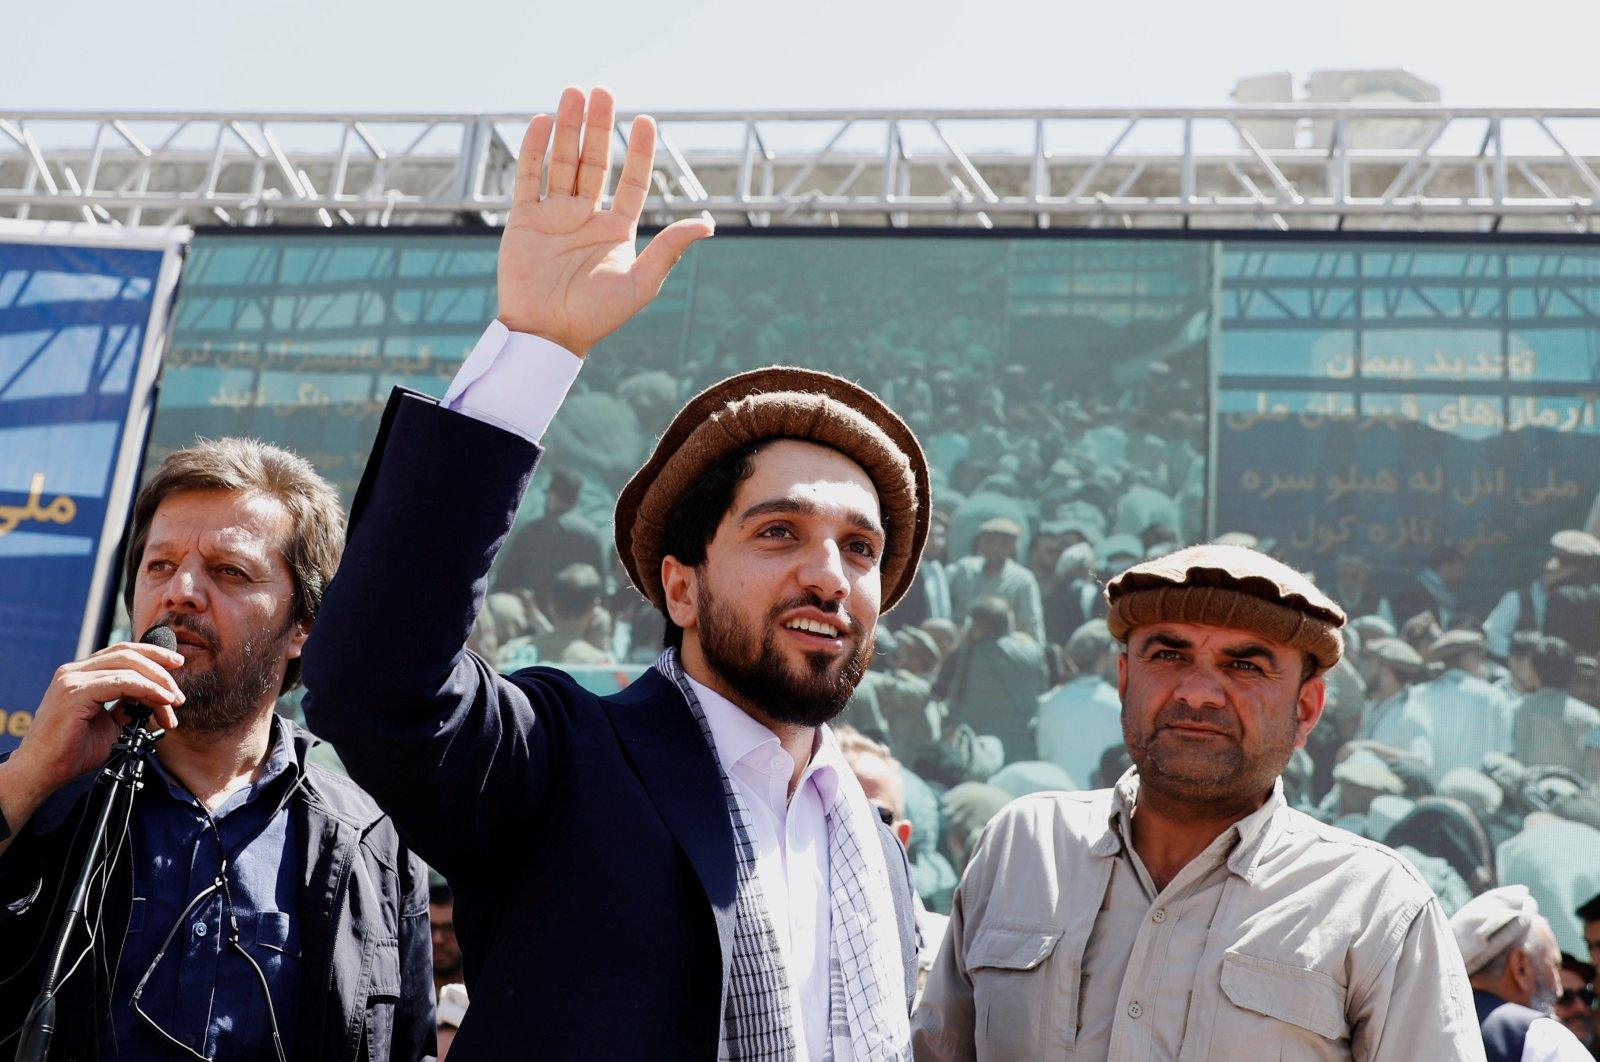 Ahmad Massoud, son of Afghanistan's slain anti-Soviet resistance hero Ahmad Shah Massoud, waves as he arrives to attend a gathering in Bazarak, Panjshir province, Afghanistan, Sept. 5, 2019. (Reuters File Photo)